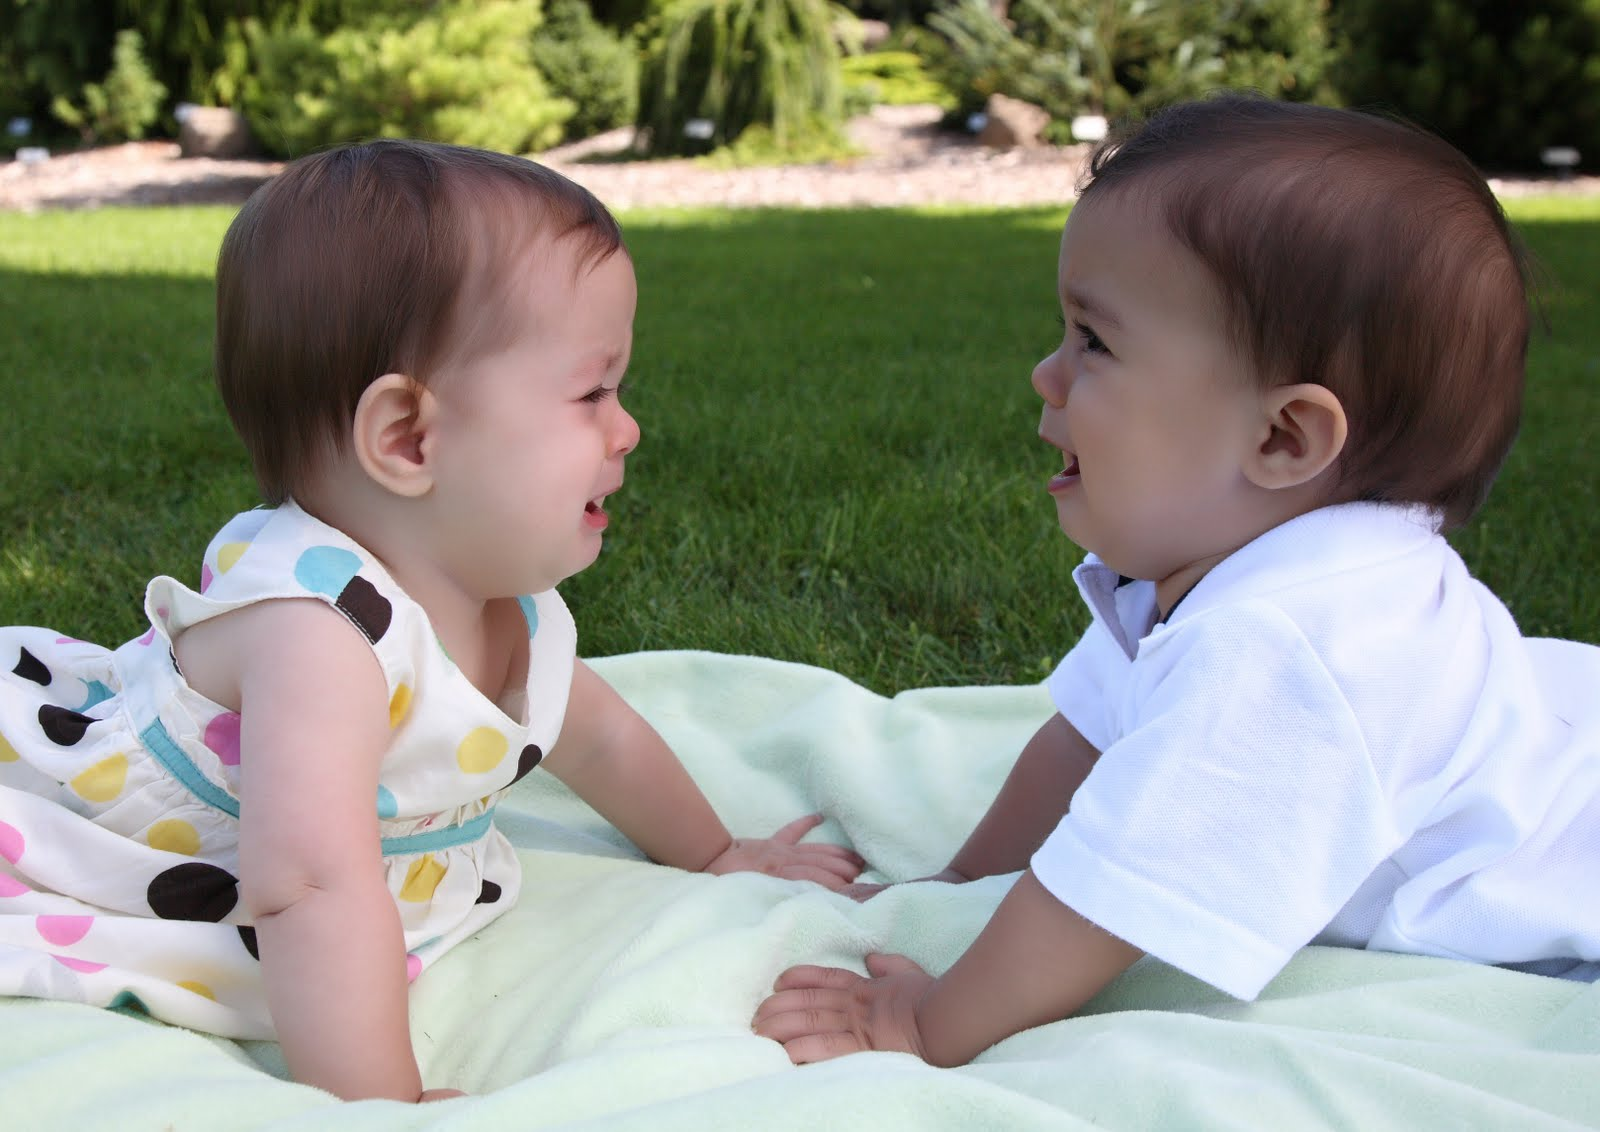 Cute Babies Pics Wallpapers: July 2012